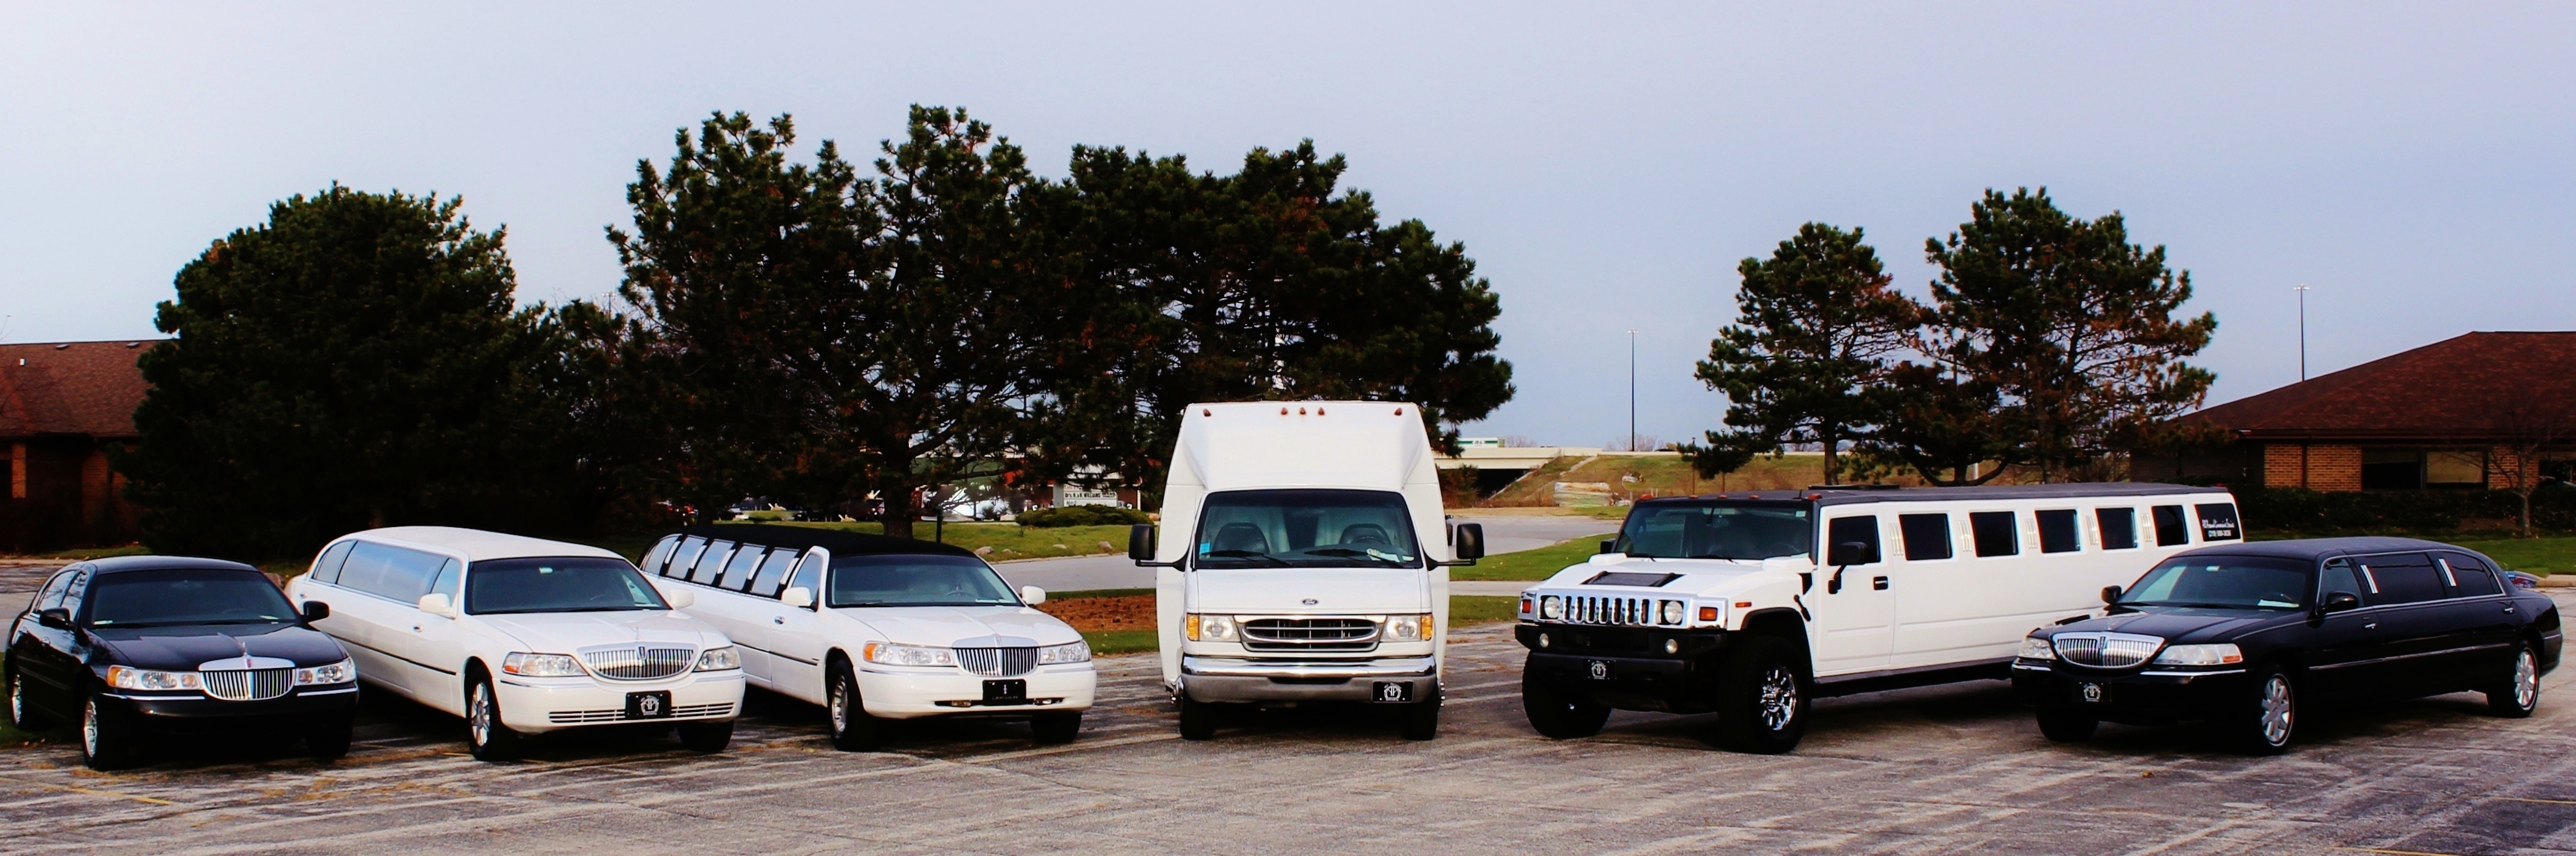 A All Around Limousine Service 6120 Johnson St Merrillville IN